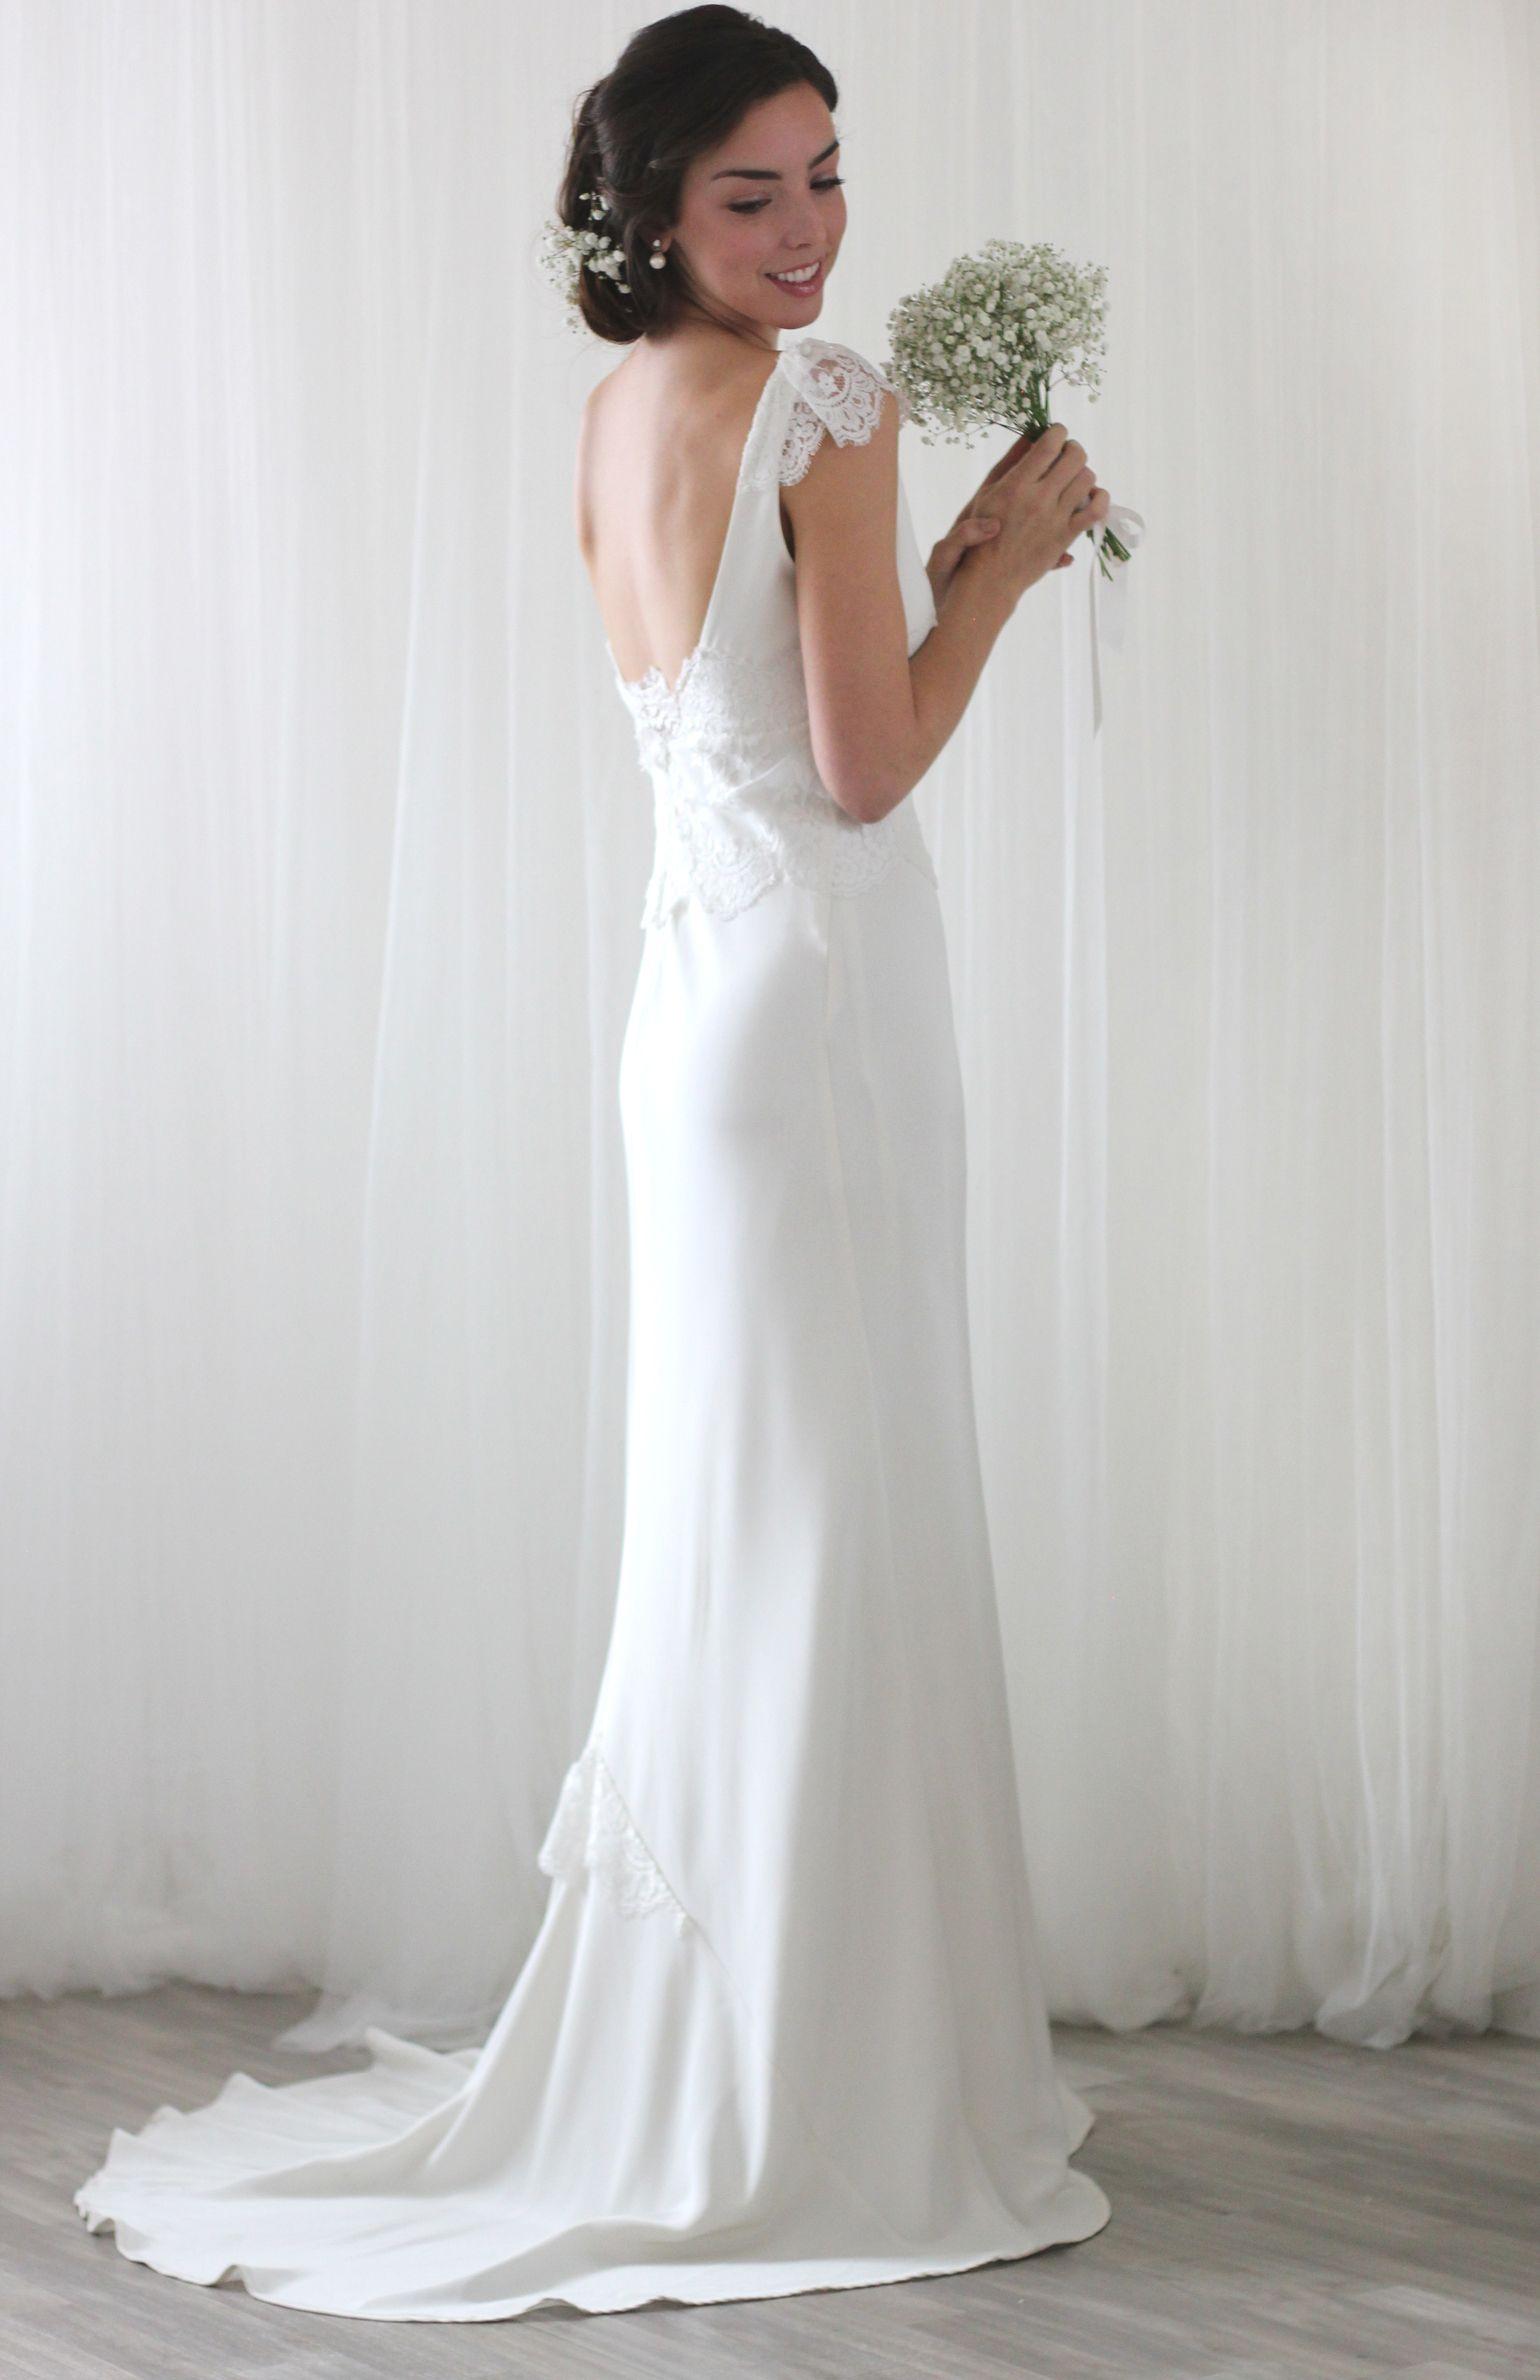 95305cd087c Ava Silk bias cut wedding dress Inspired by all things pretty